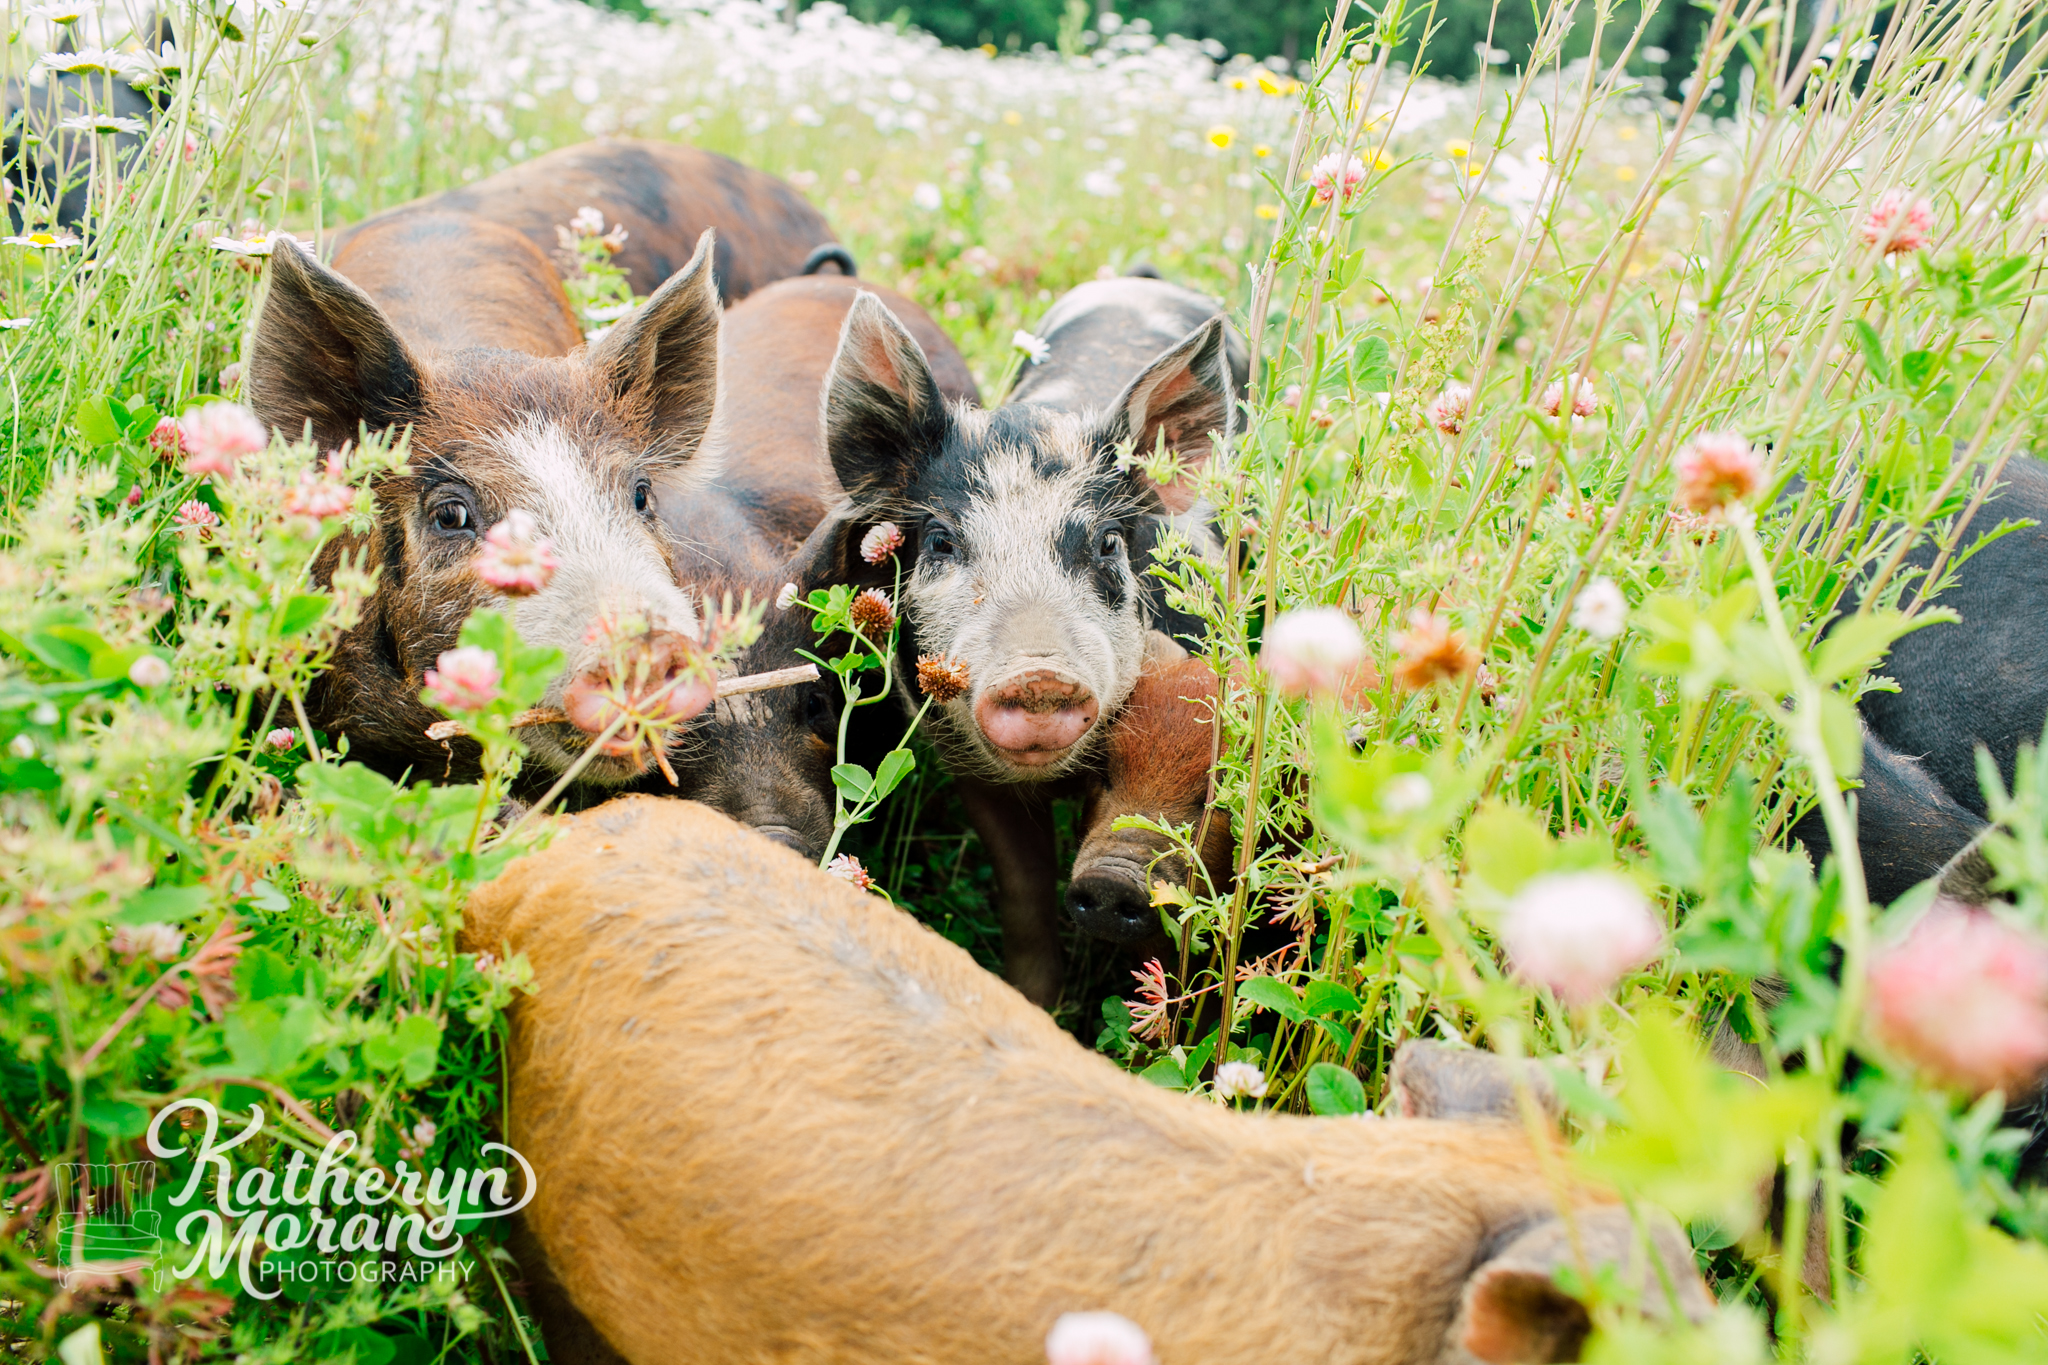 bellingham-marketing-photographer-katheryn-moran-alluvial-farms-spring-2018-15.jpg